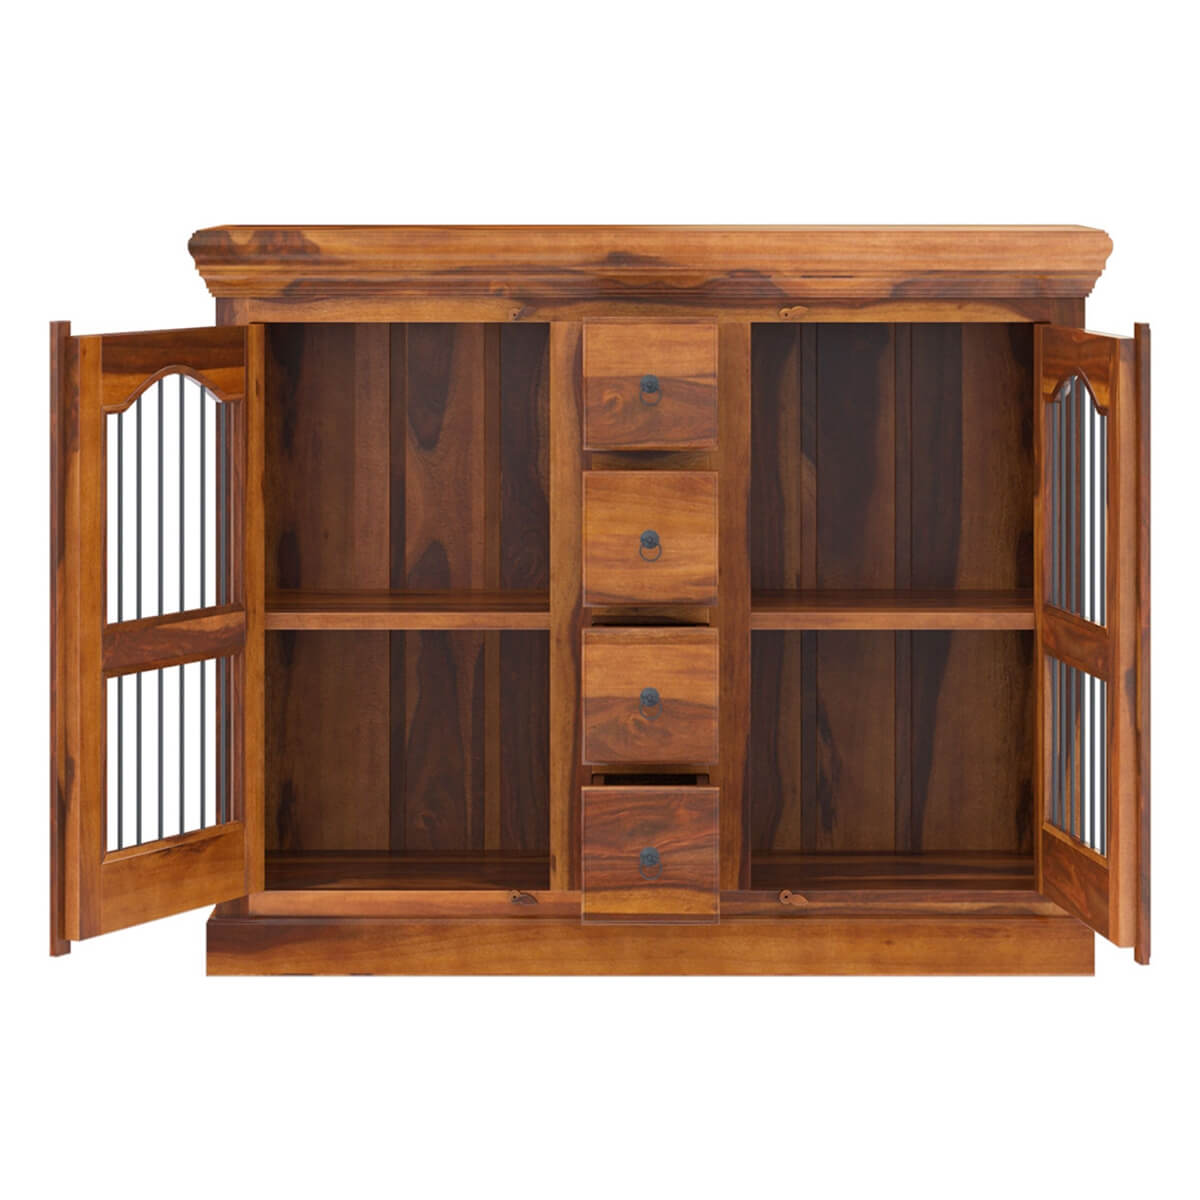 Handmade Solid Wood Island Units: Arlington Handmade Solid Wood Dining Room 4 Drawer Credenza